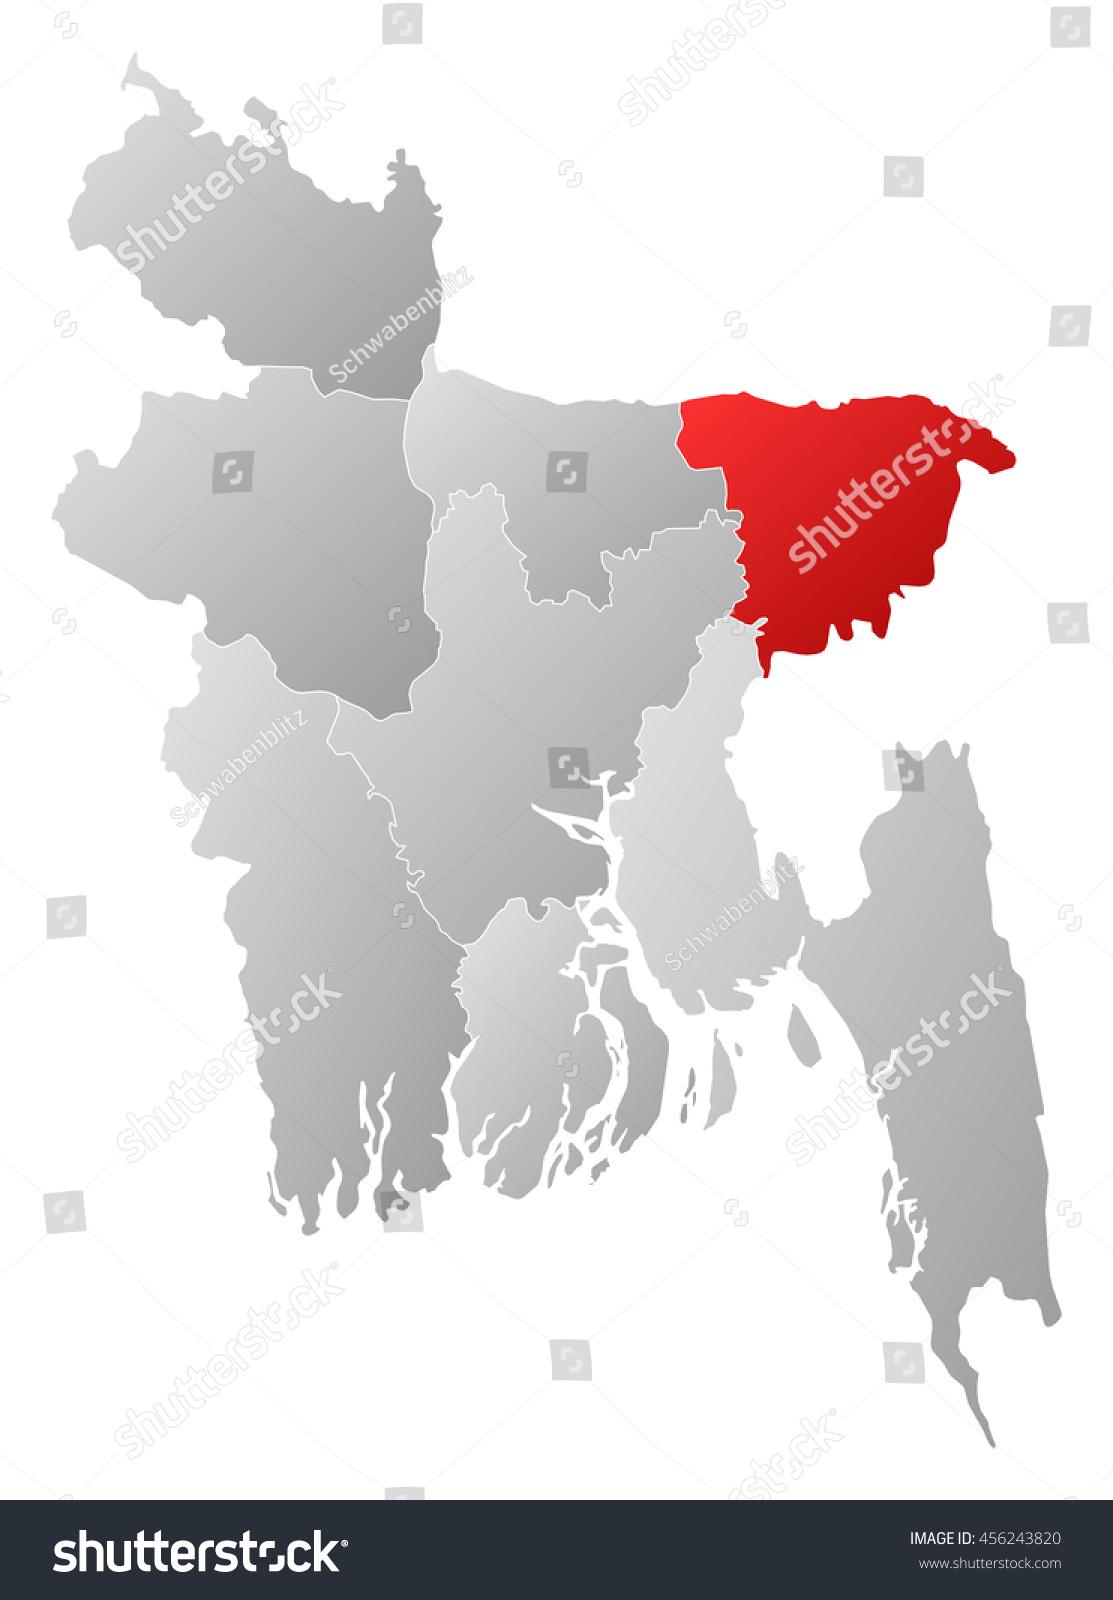 Map bangladesh sylhet stock illustration 456243820 shutterstock map bangladesh sylhet gumiabroncs Image collections